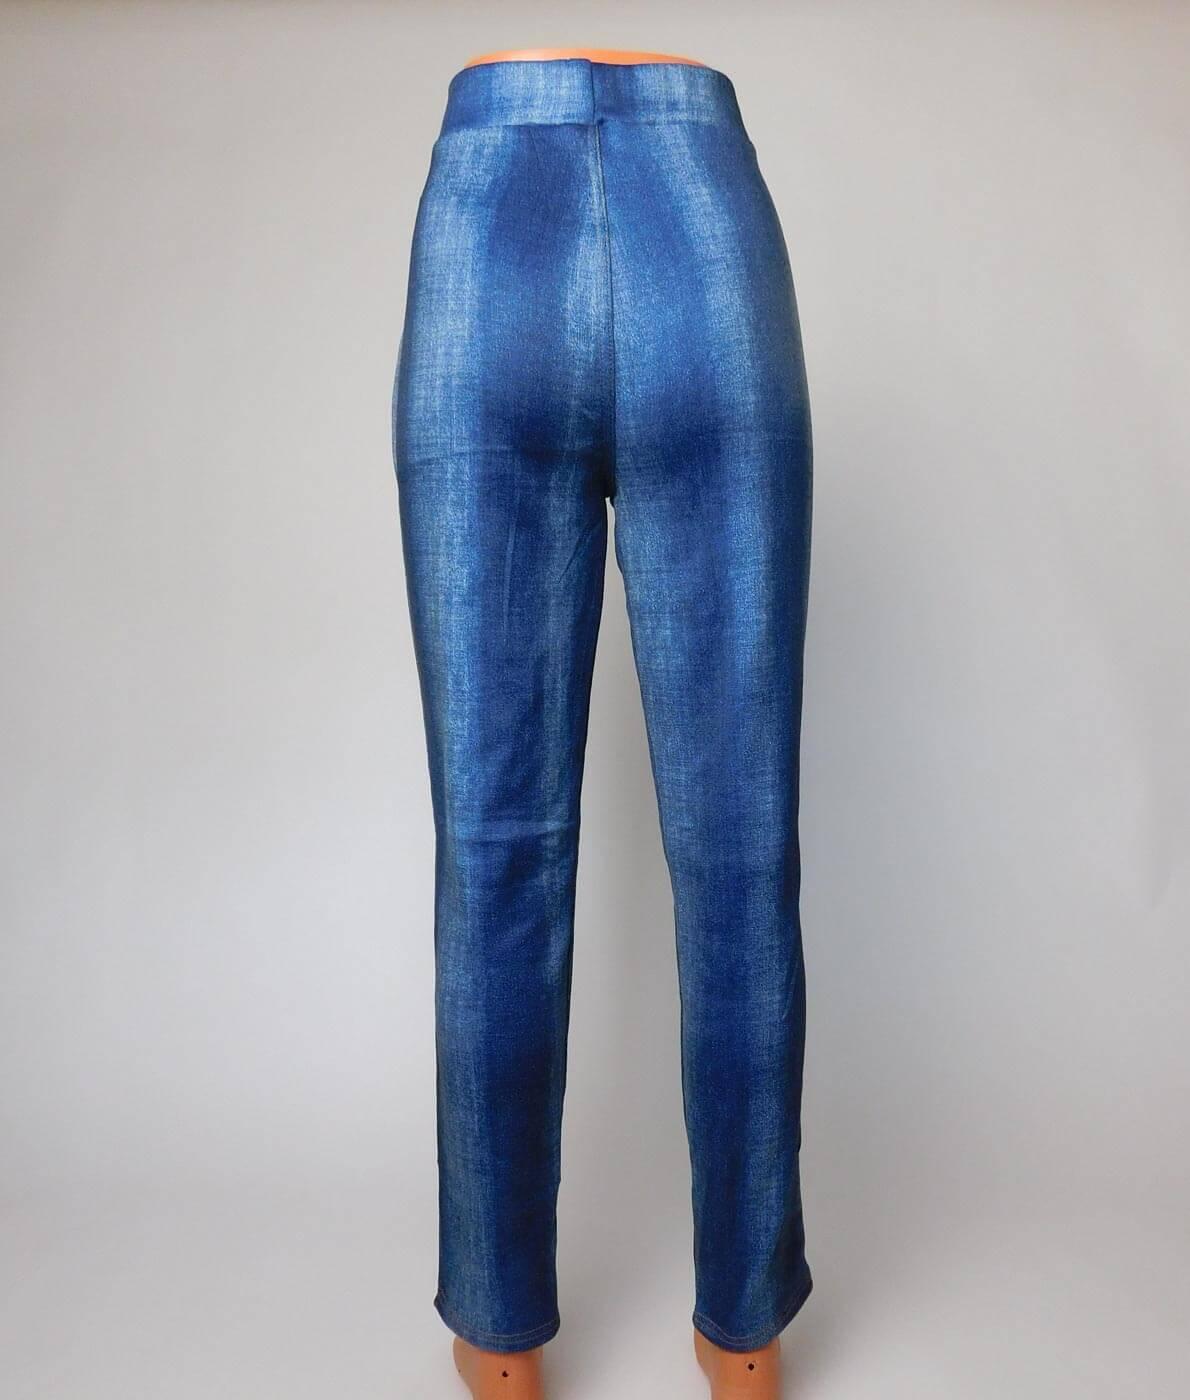 7a9d5bc54b Nagyméretű farmer hatású vastag téli leggings - N194-144 - Kék